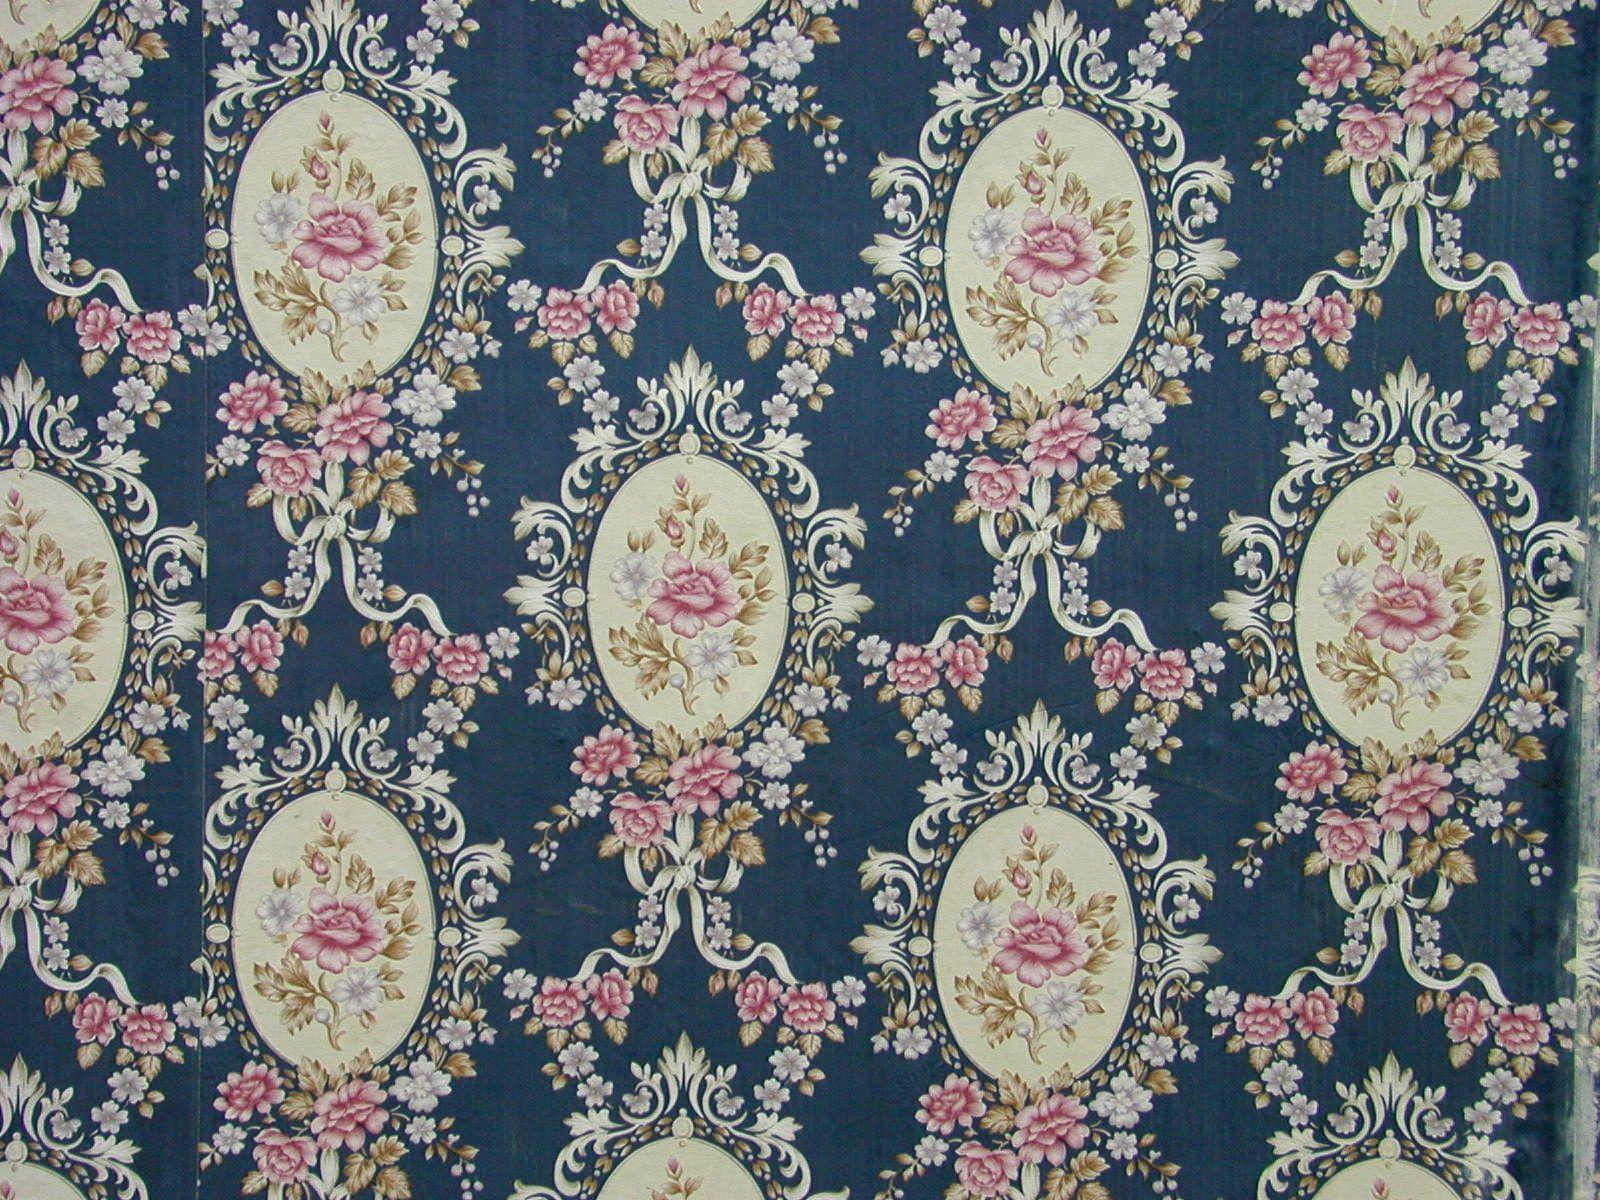 Cool Wallpapers For Phones 3d Victorian Wallpaper 2048x1536 6195